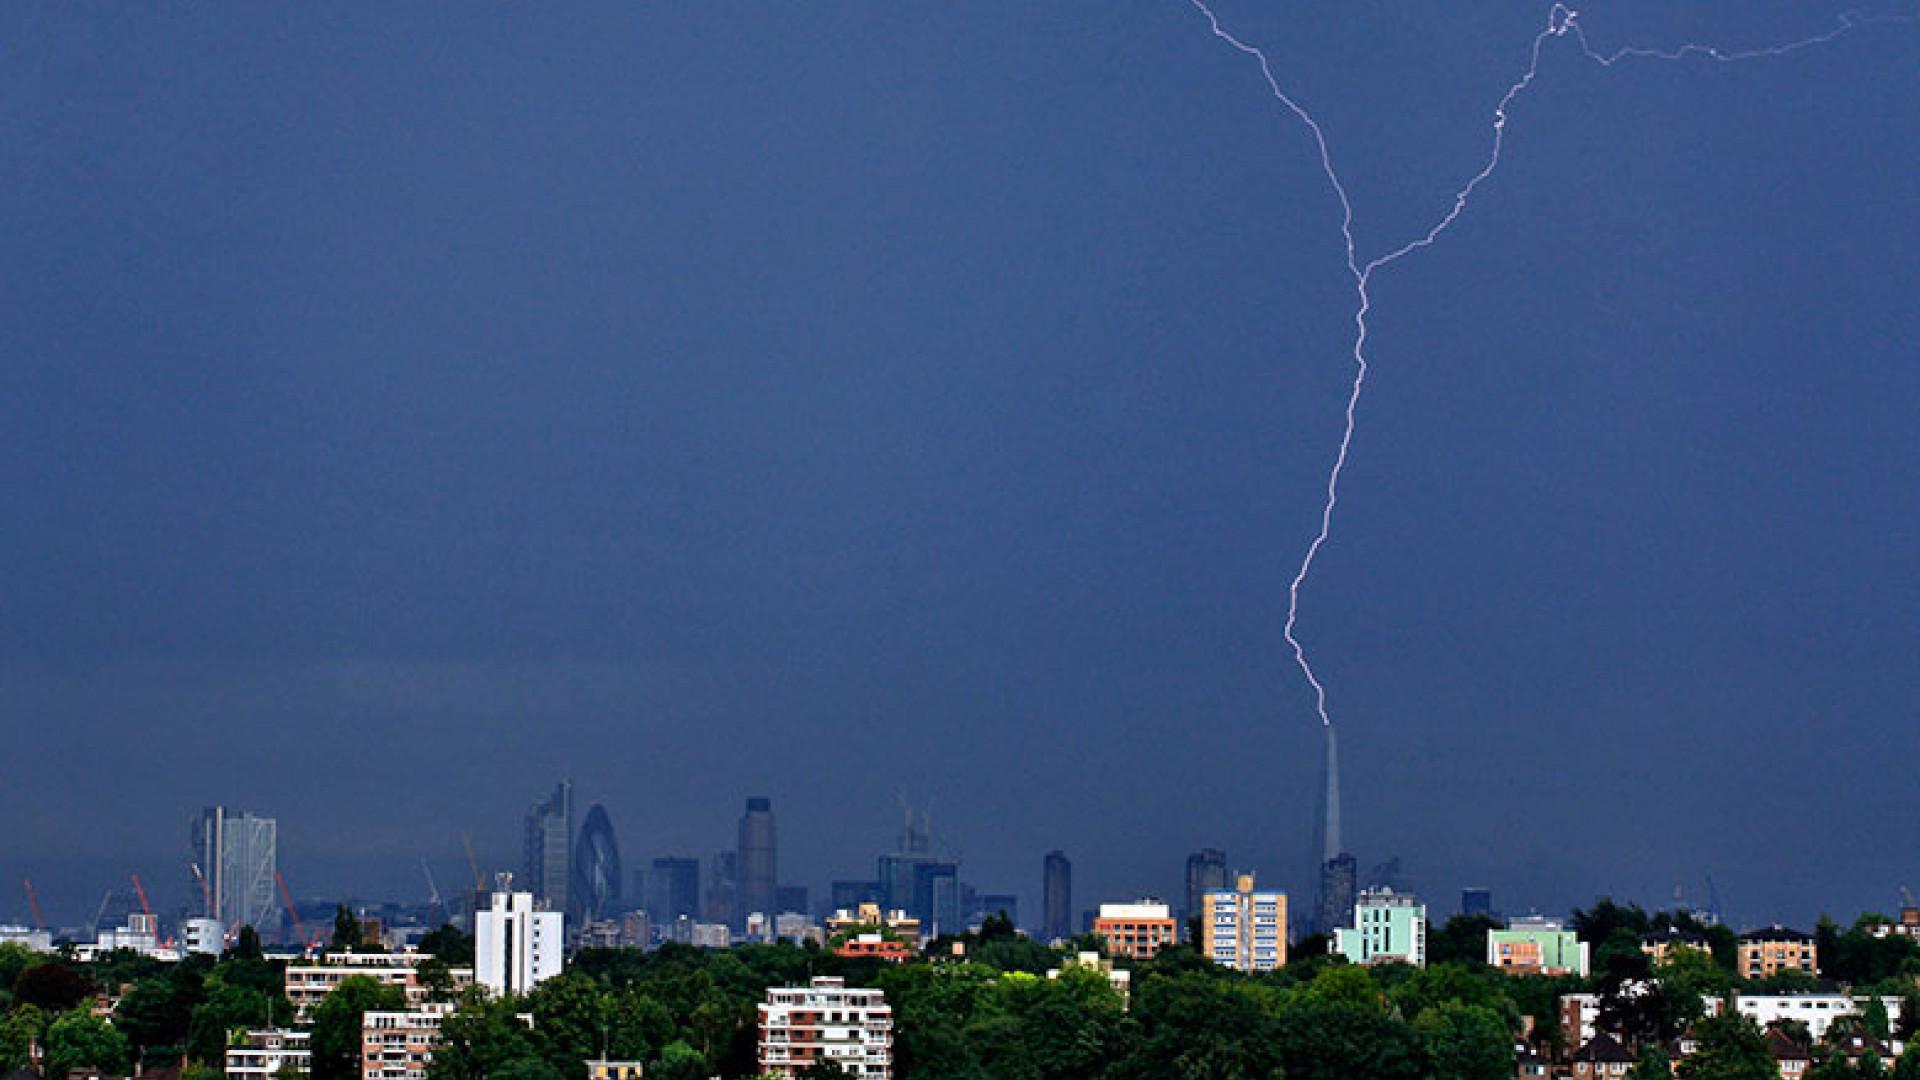 Lighting-Strikes-the-Shard,-London-by-Nigel-Morton-(Take-a-view,-2013)